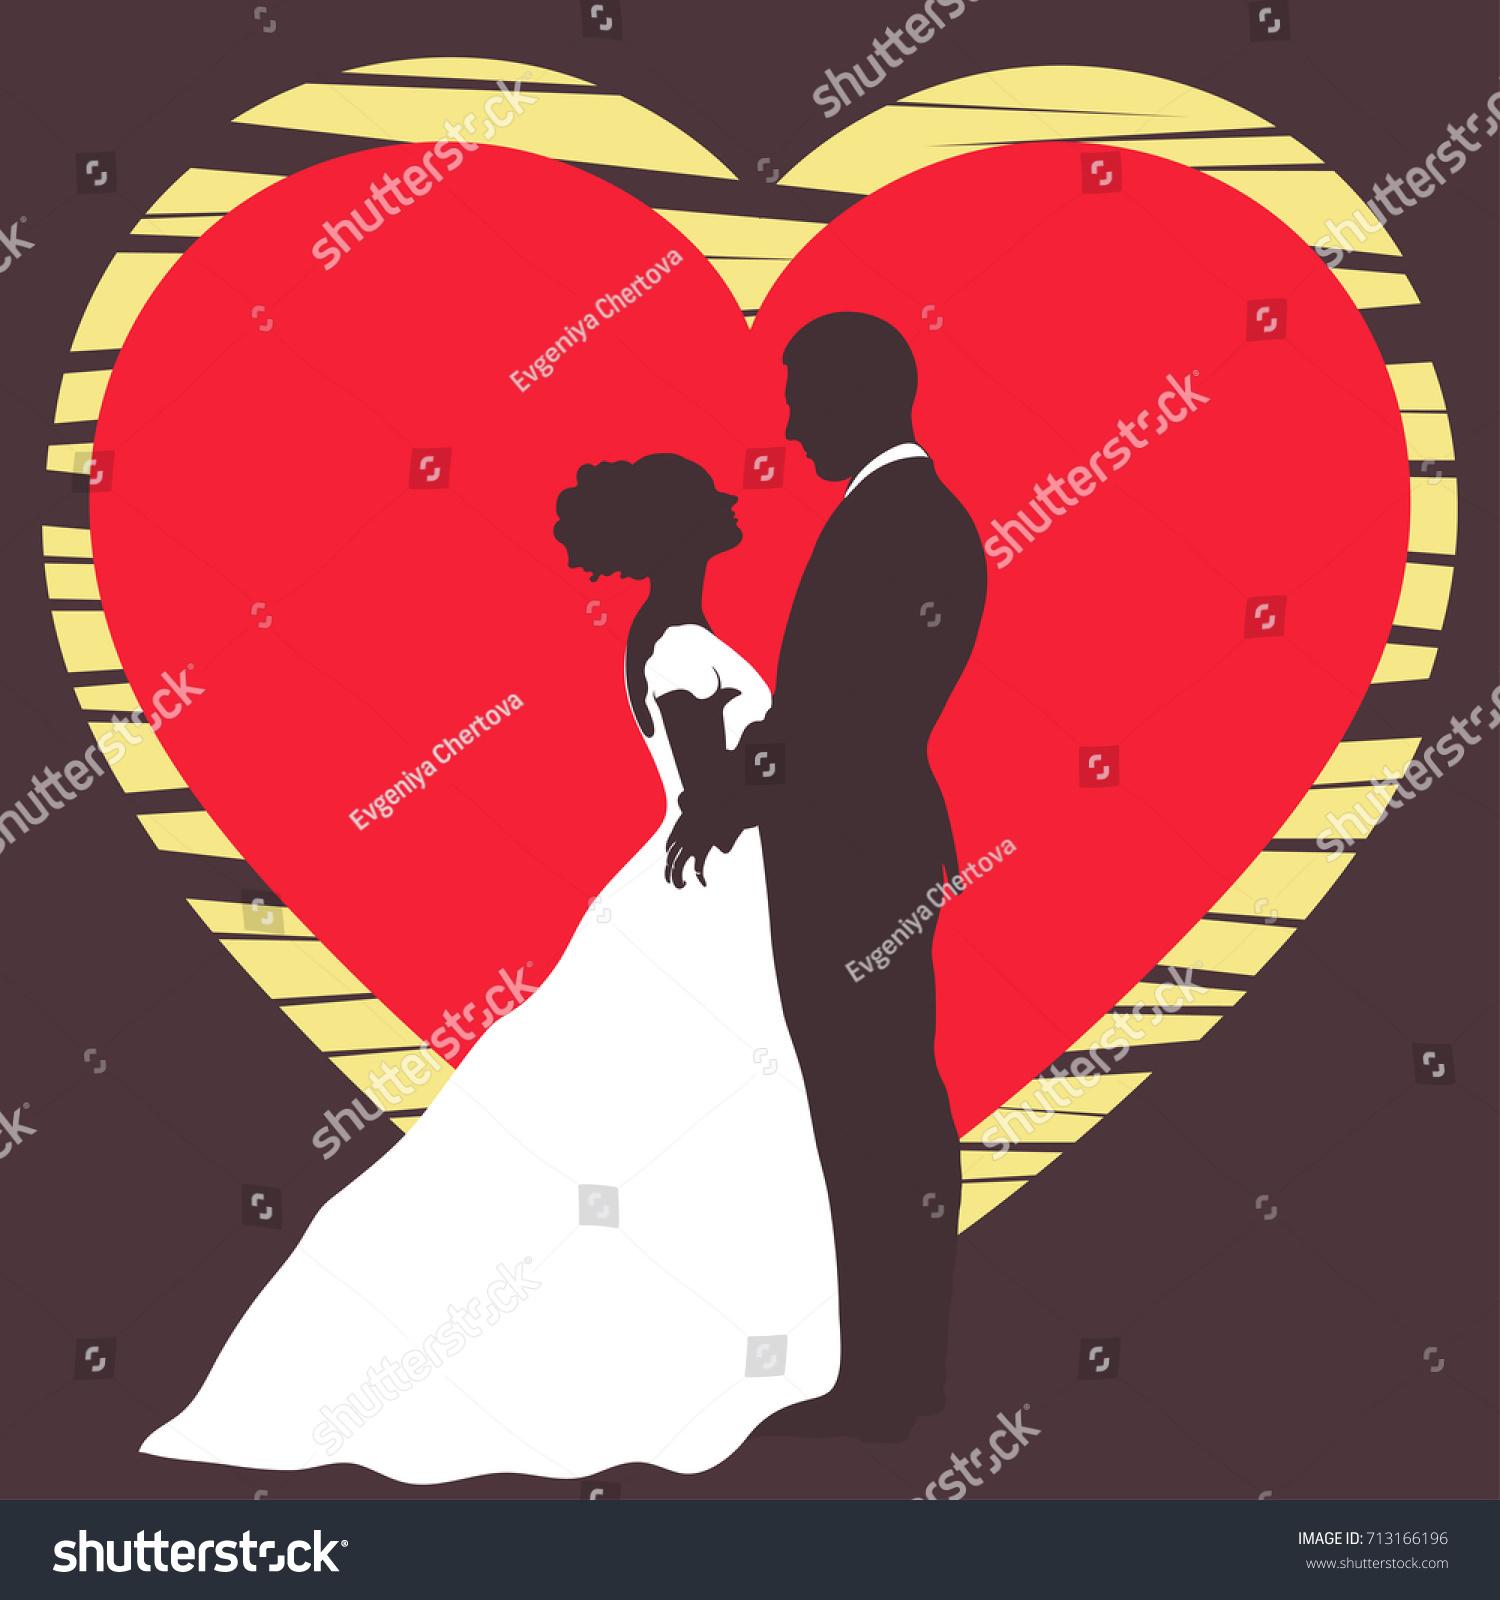 Bride Groom Silhouette Wedding Invitation Card Stock Vector (Royalty ...